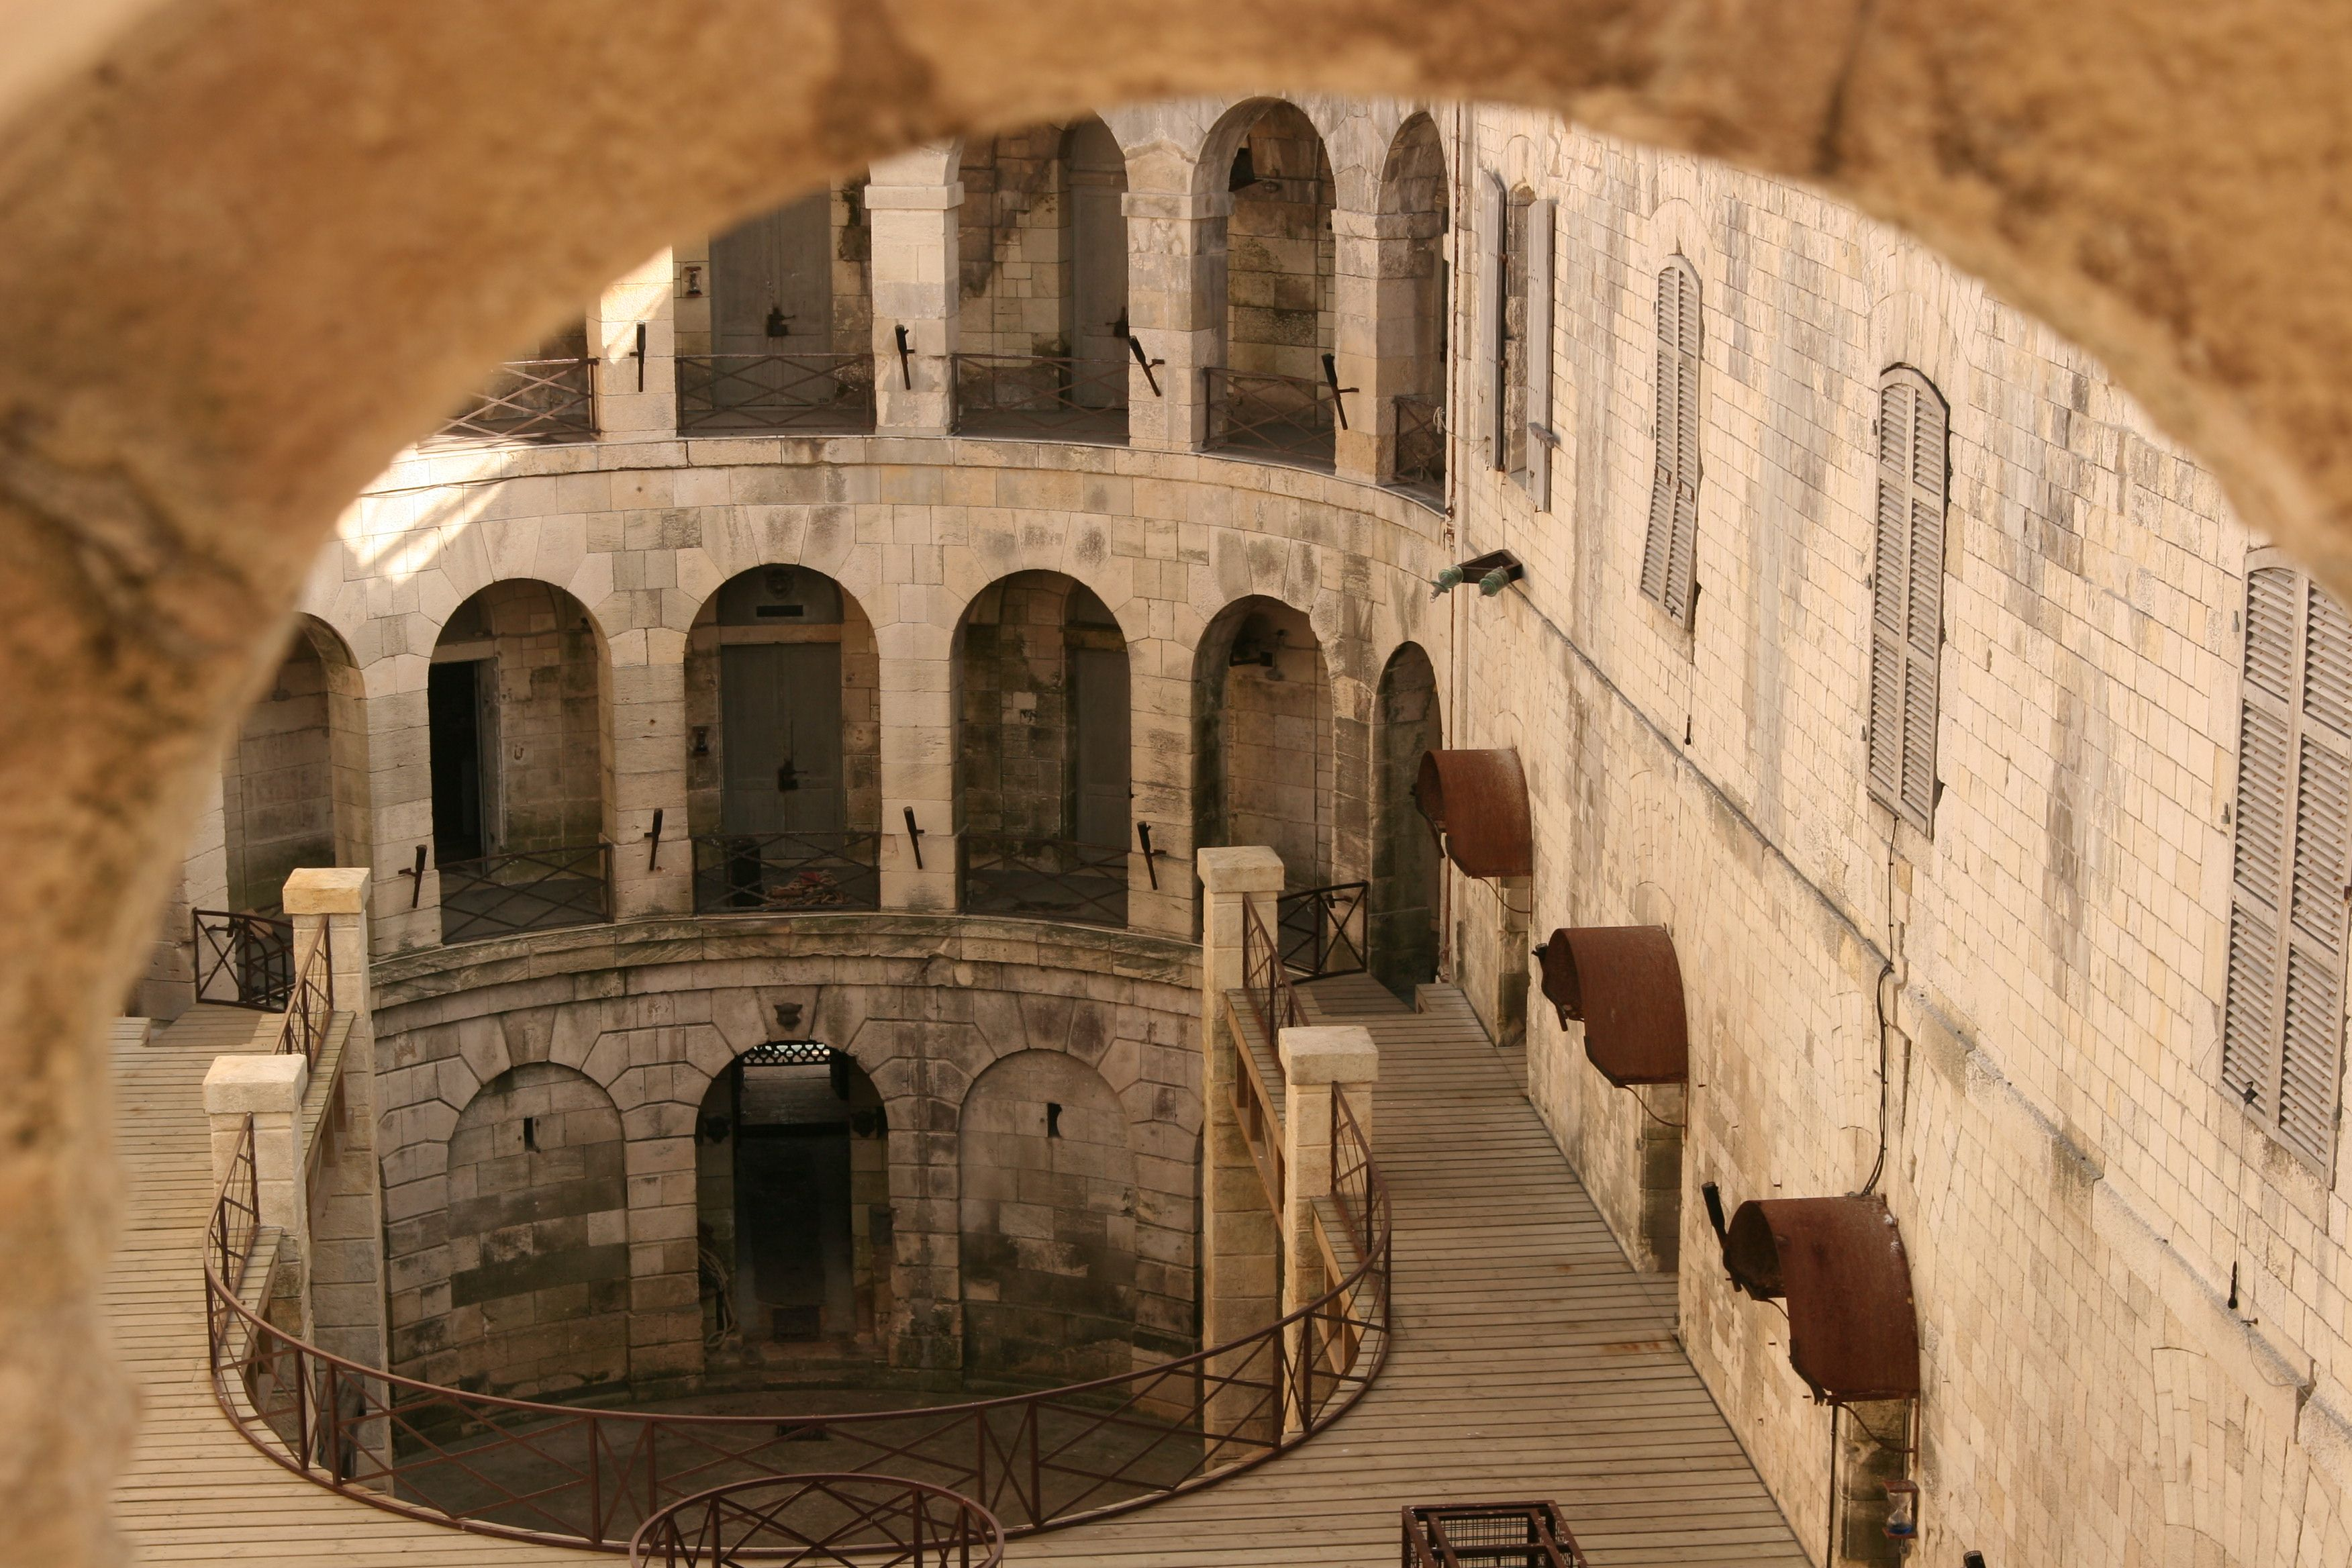 Inside courtyard of Fort Boyard | Escape the Fort | Pinterest | Forts